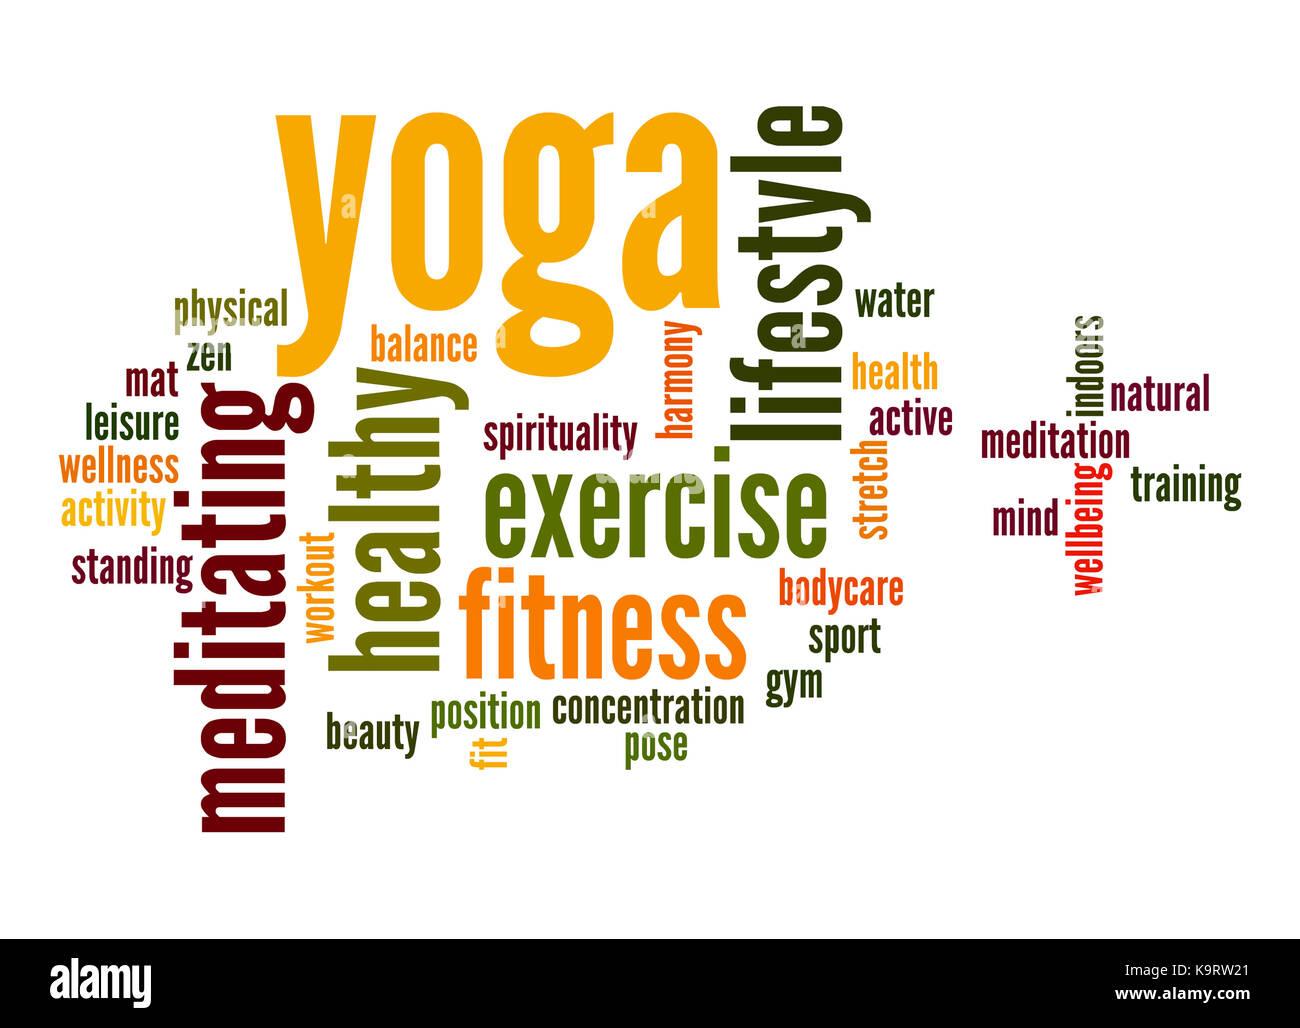 Yoga Word Cloud Stock Photo 160949769